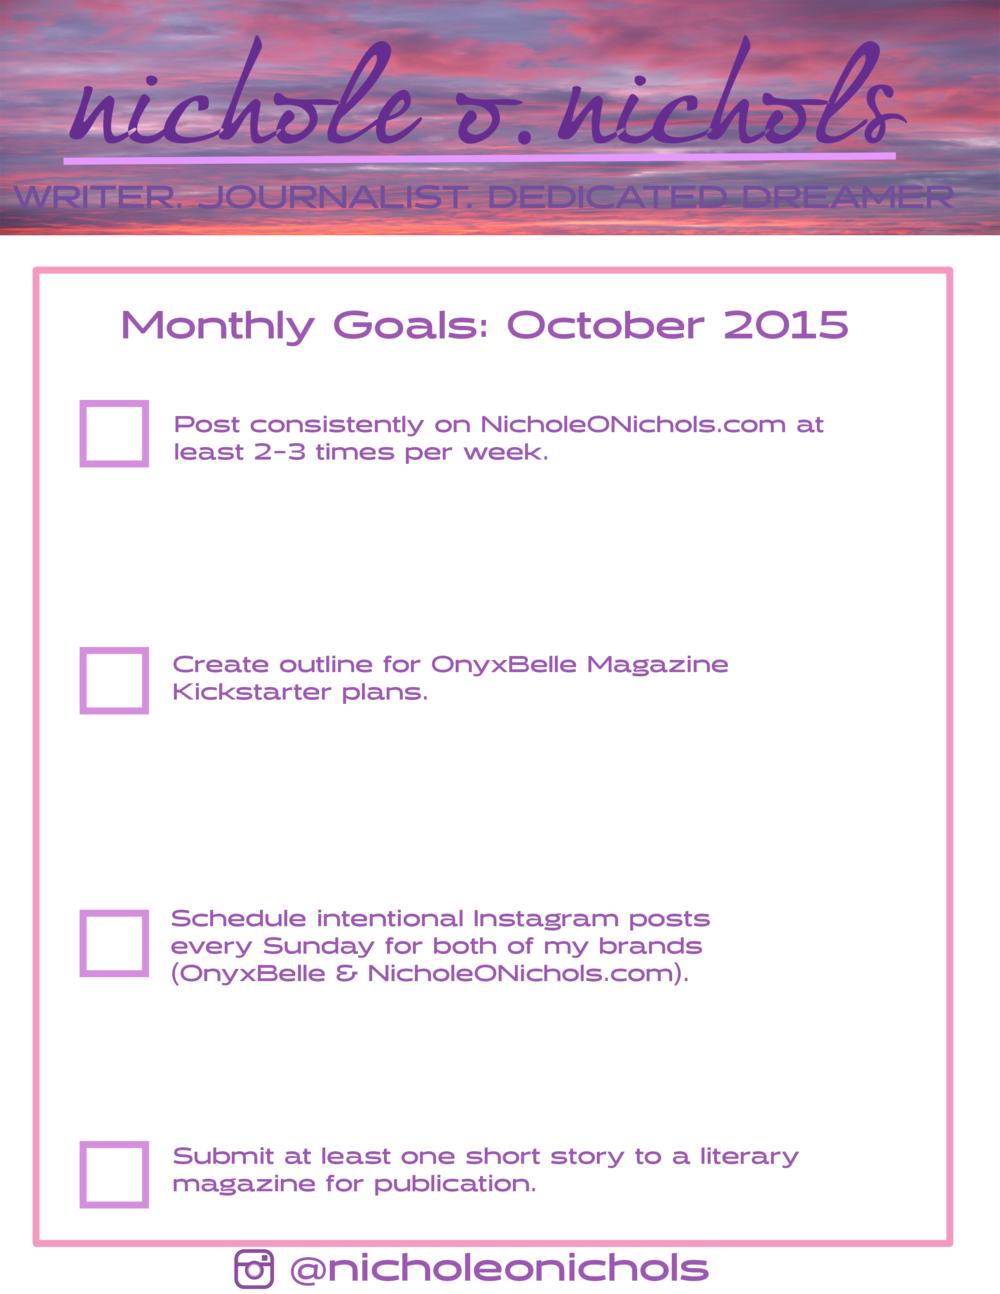 NicholeONicholsGoals_Oct2015.png